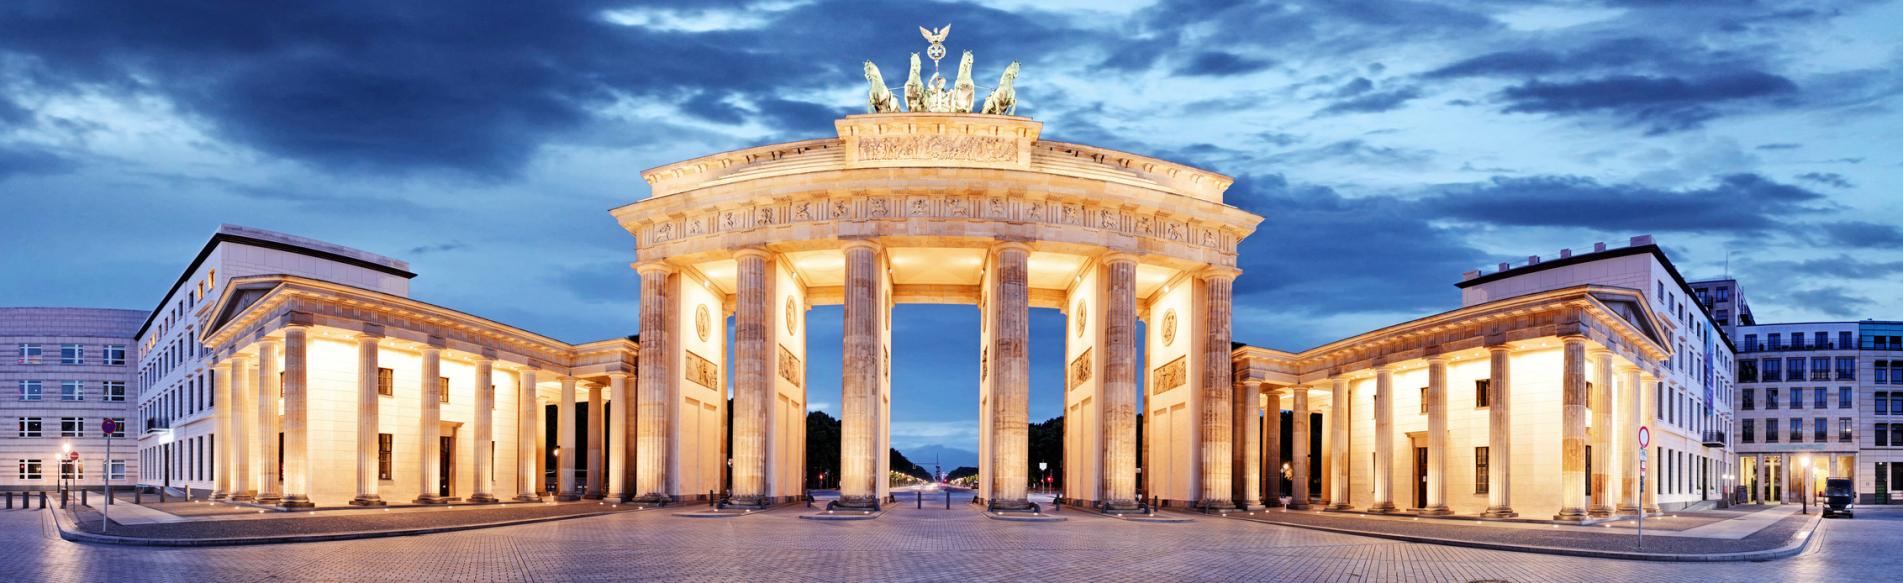 Hotels Naehe Brandenburger Tor Berlin